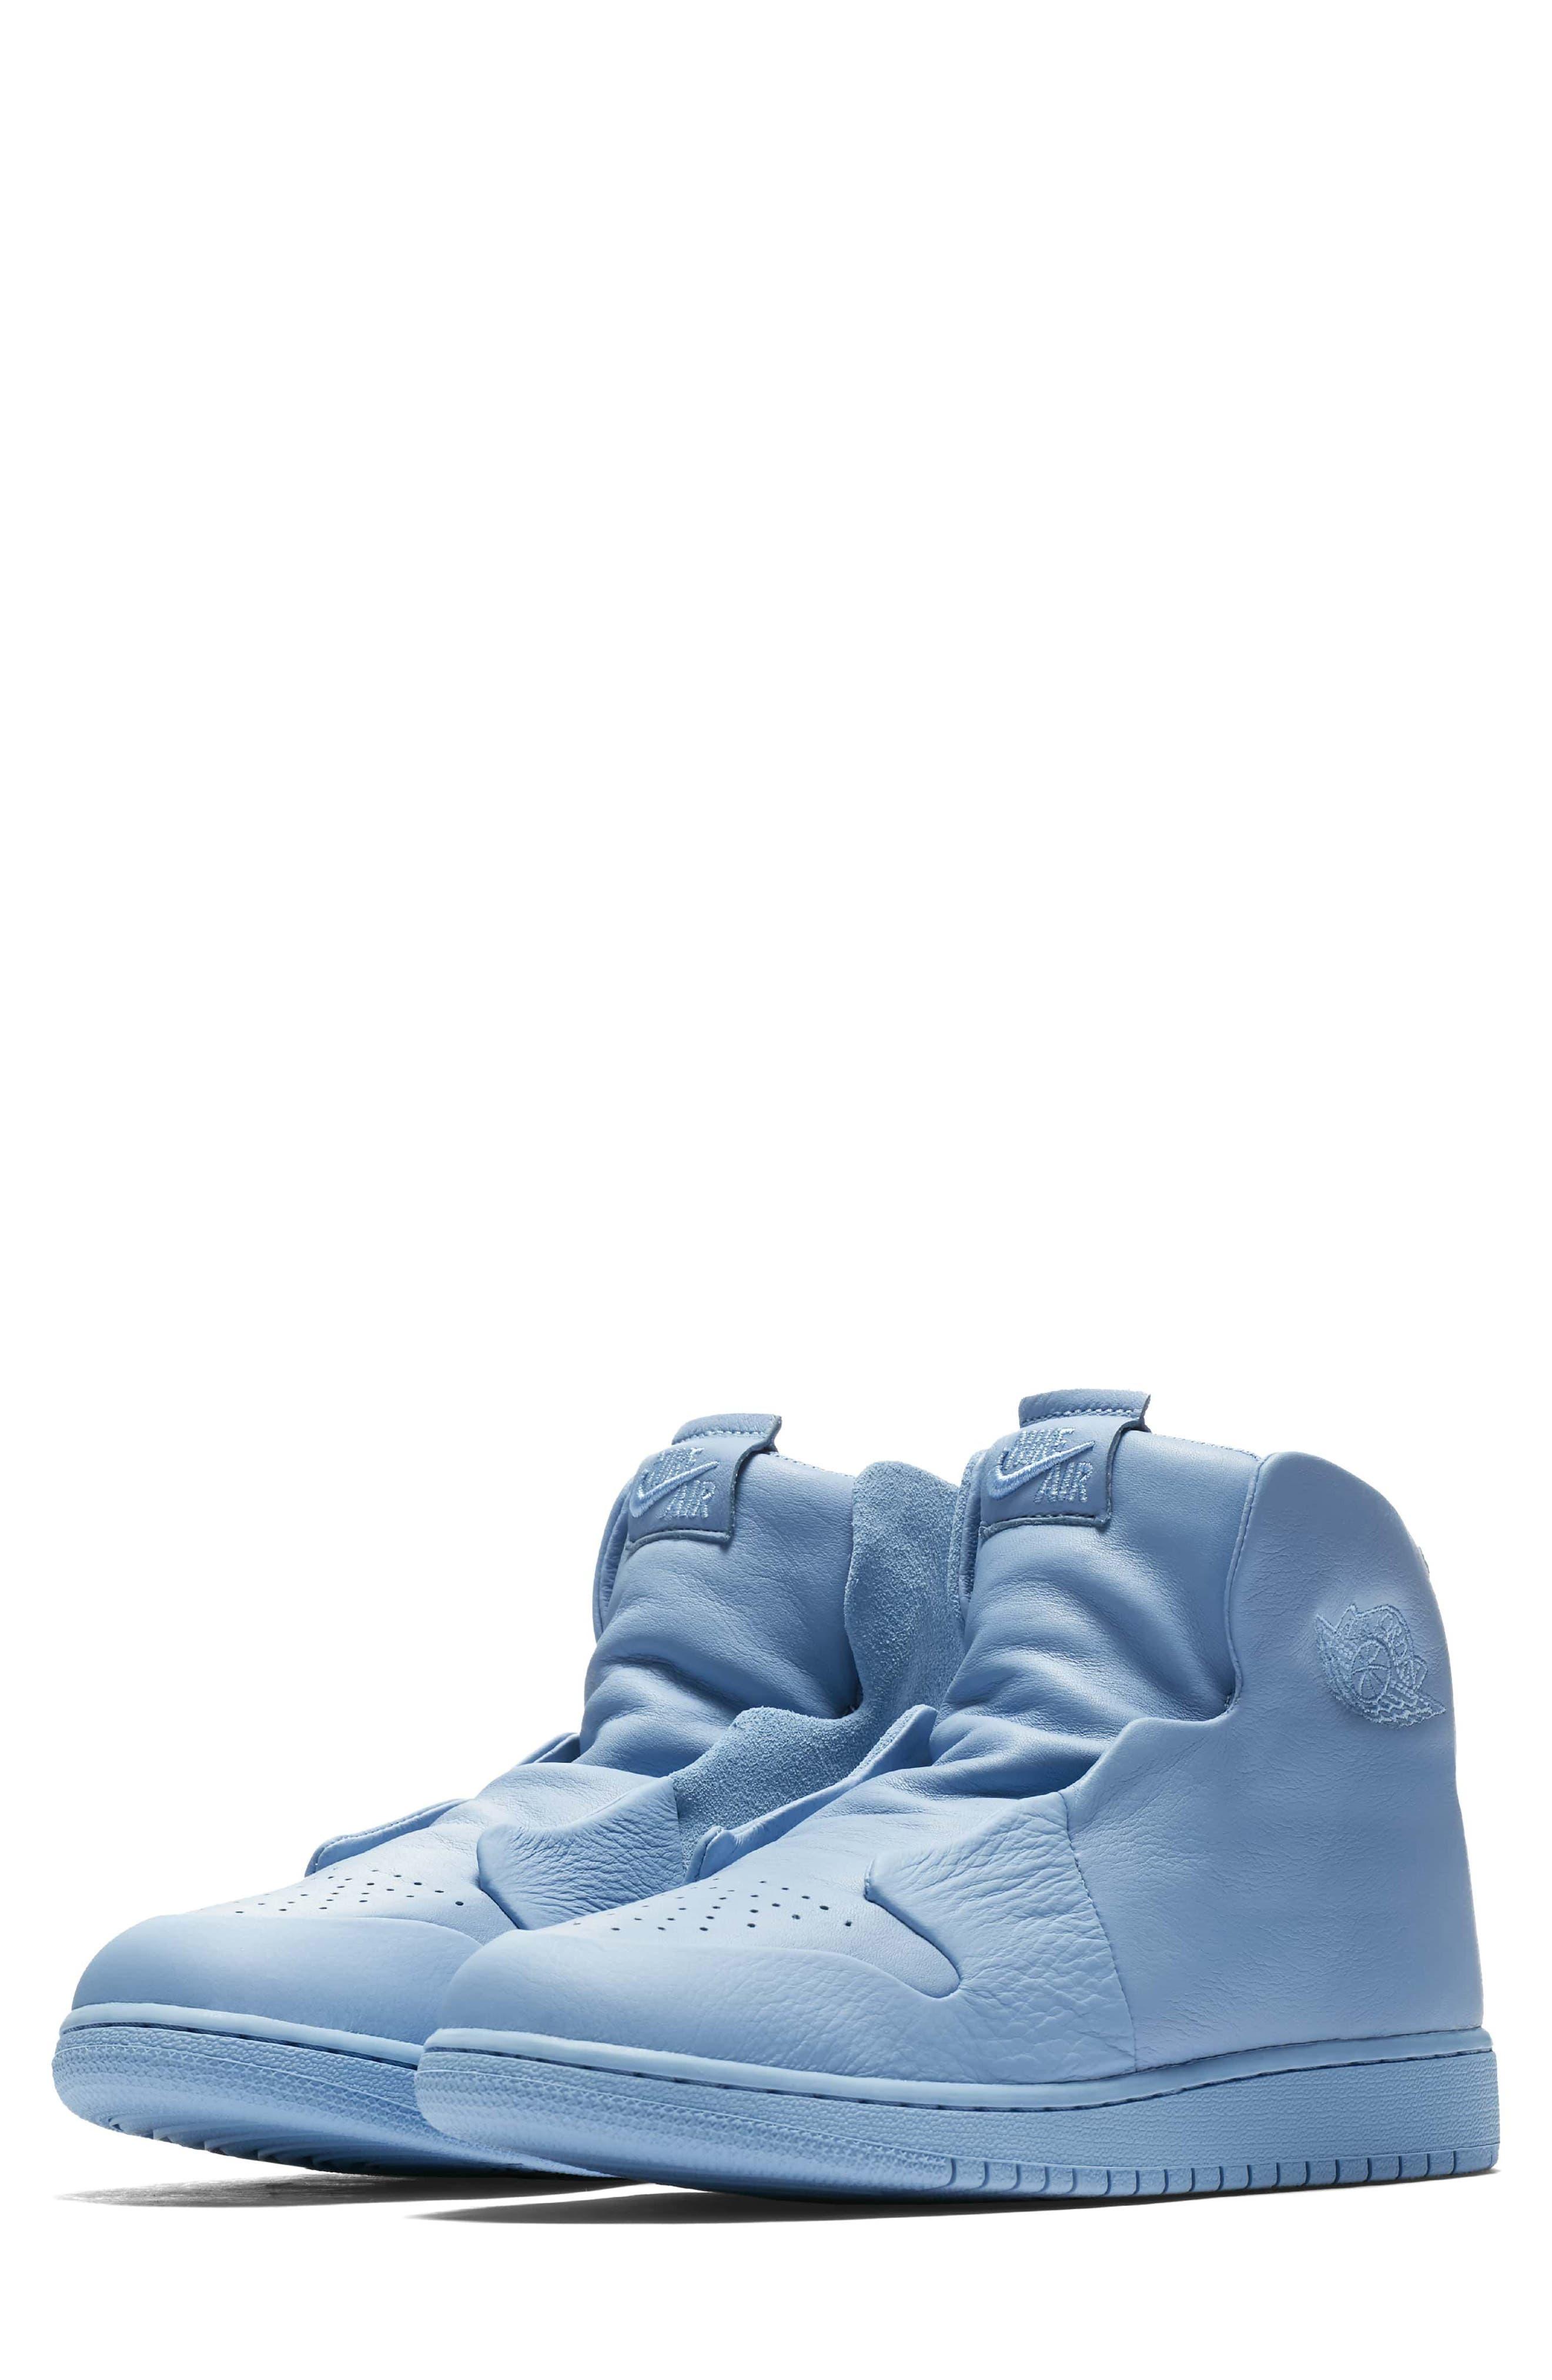 Air Jordan 1 Sage XX High Top Sneaker,                         Main,                         color, Light Blue